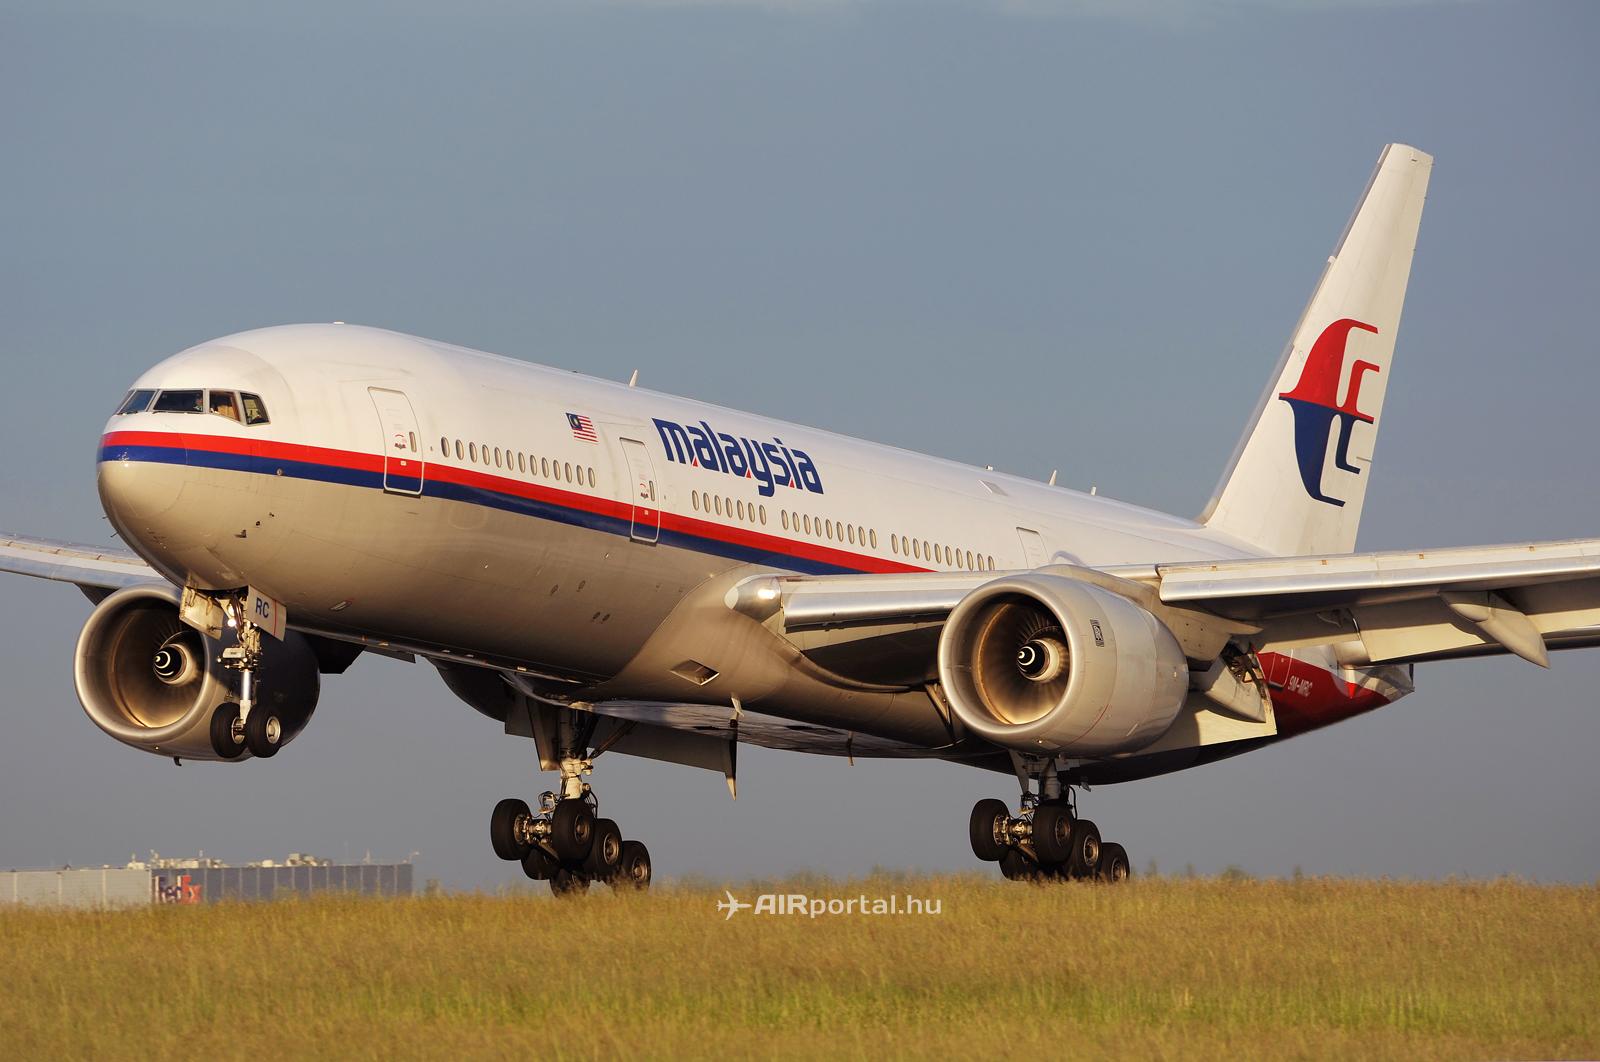 A Malaysian Airlines Boeing 777-200ER típusú repülőgépe a párizsi Charles de Gaulle repülőterén.(Fotó: Kovács Gábor - AIRportal.hu)   © AIRportal.hu